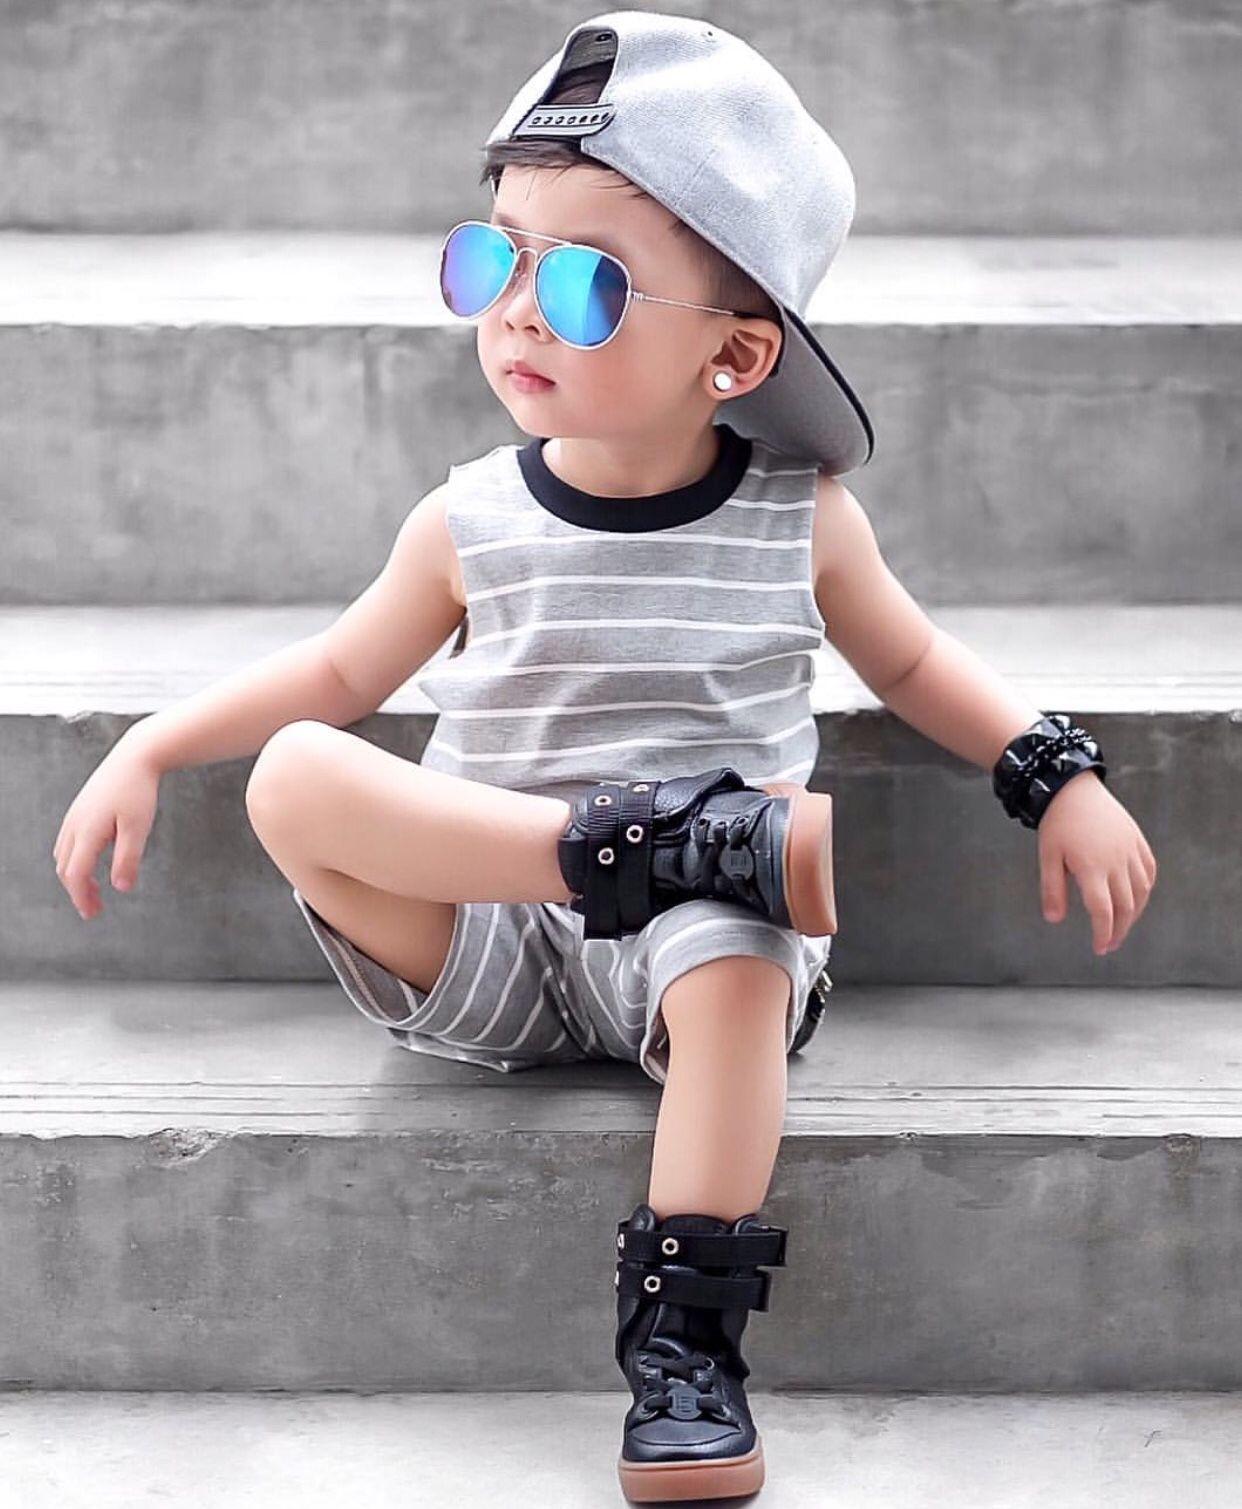 Whatsapp Dp Profile Pics 150 Photos Collection Free Download Kids Outfits Kids Fashion Boy Baby Boy Fashion